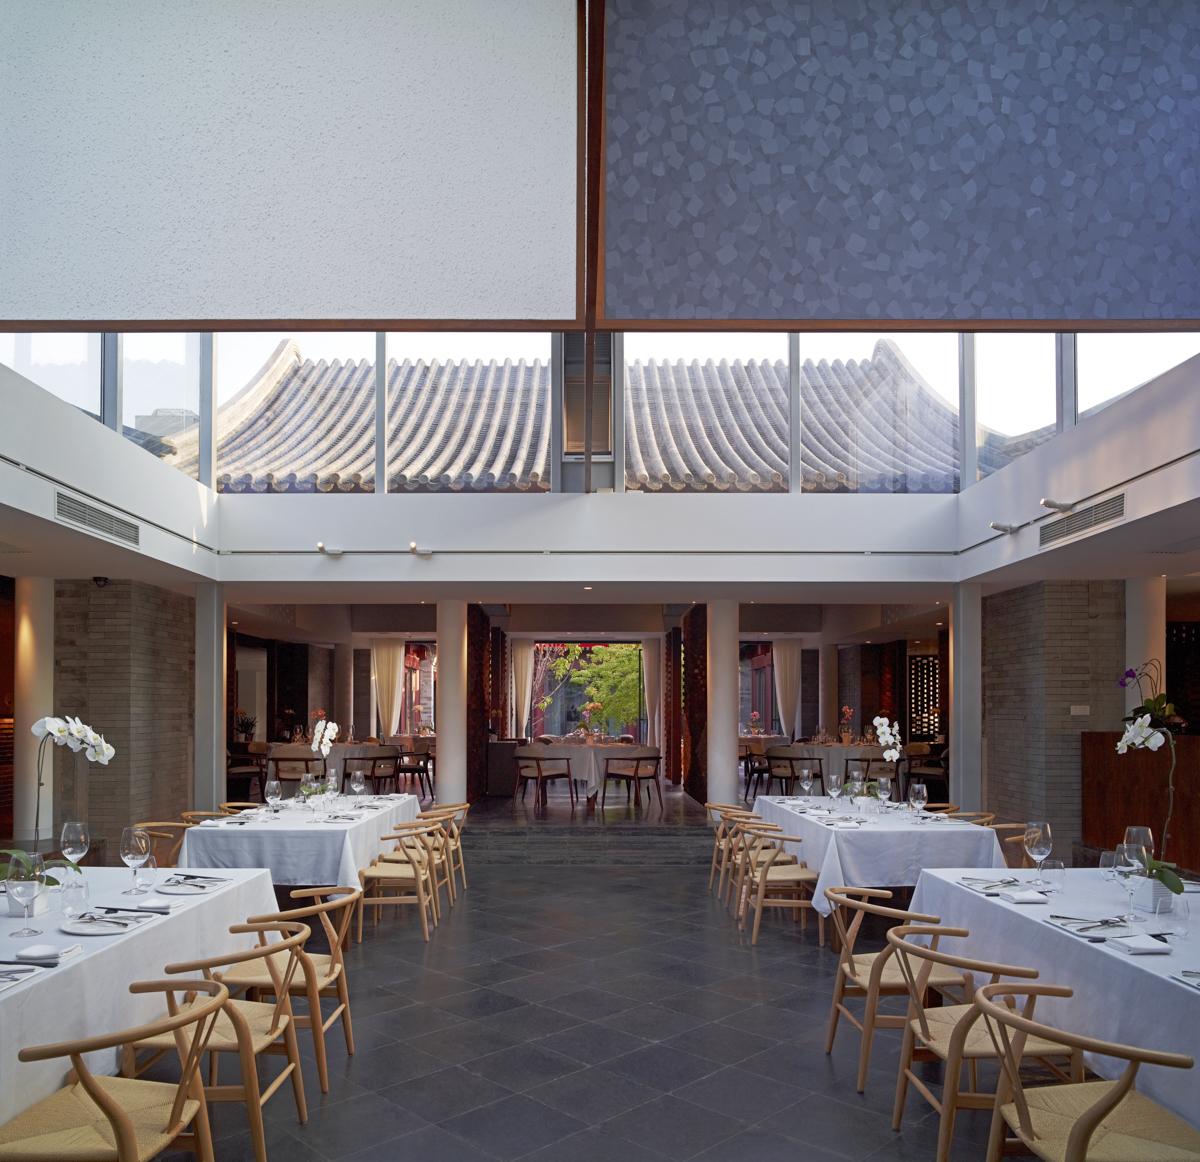 King's Joy Restaurant, Beijing, China 2012